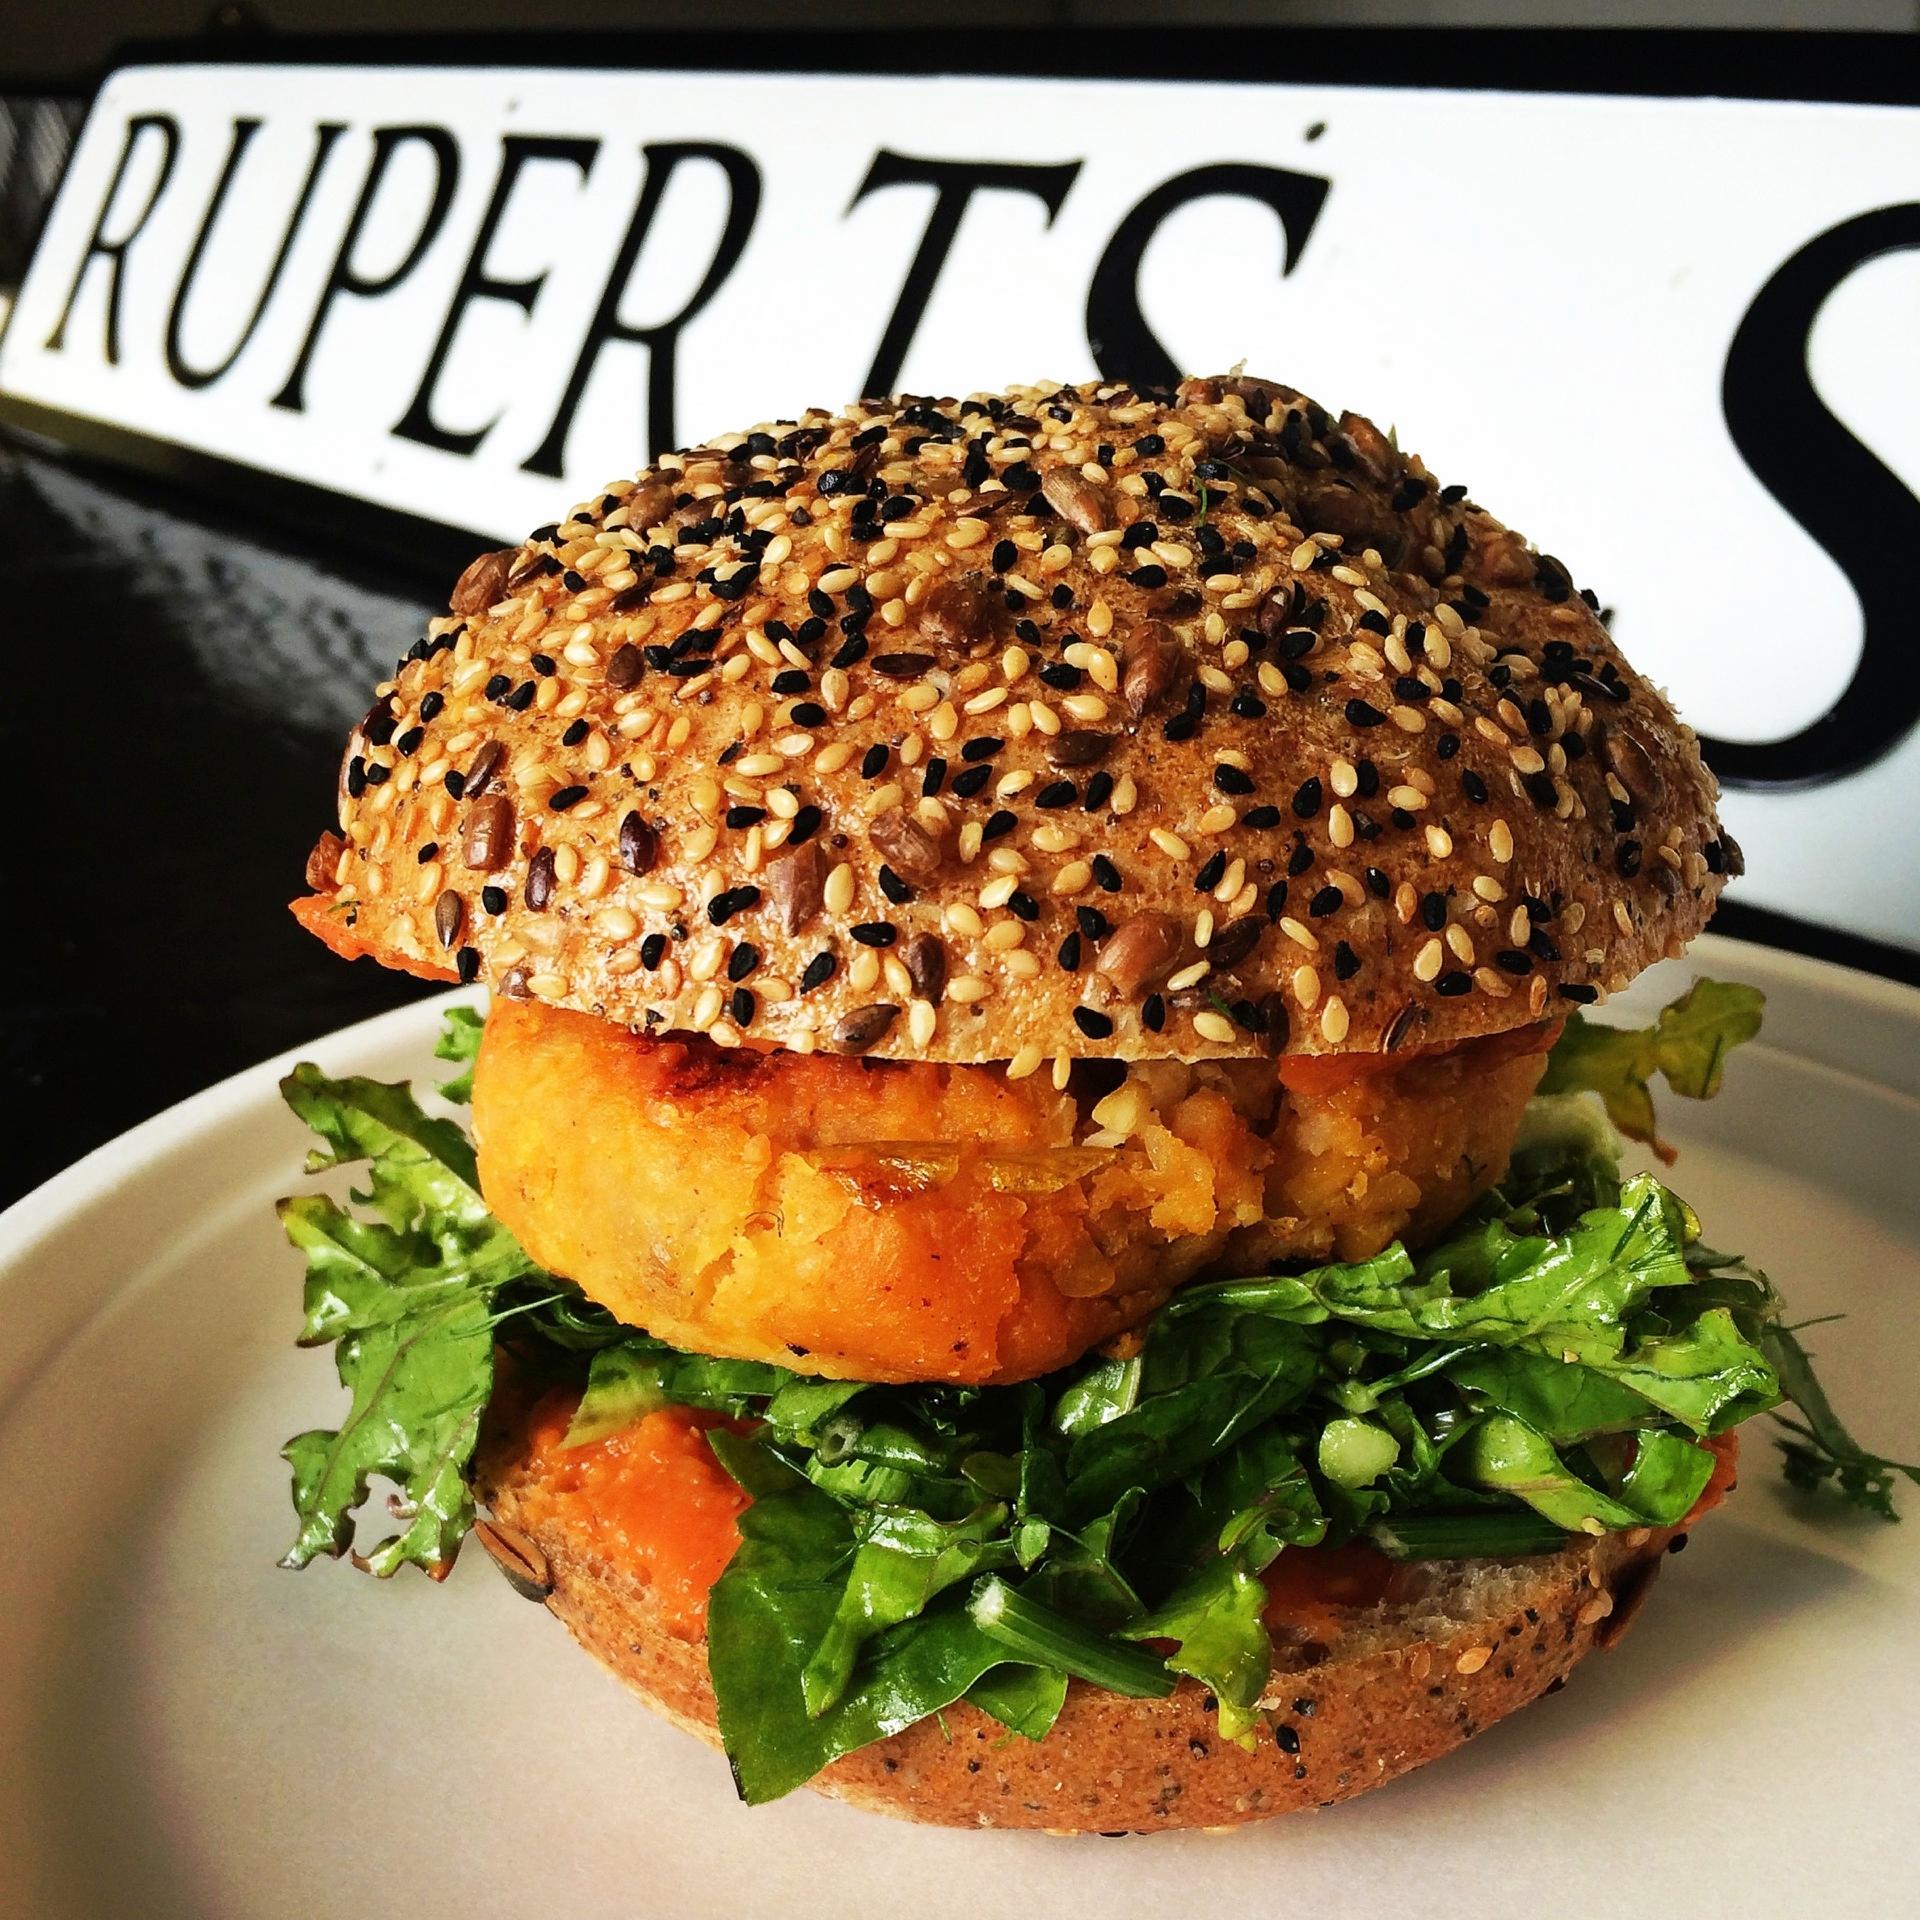 Potato cake burger.jpg